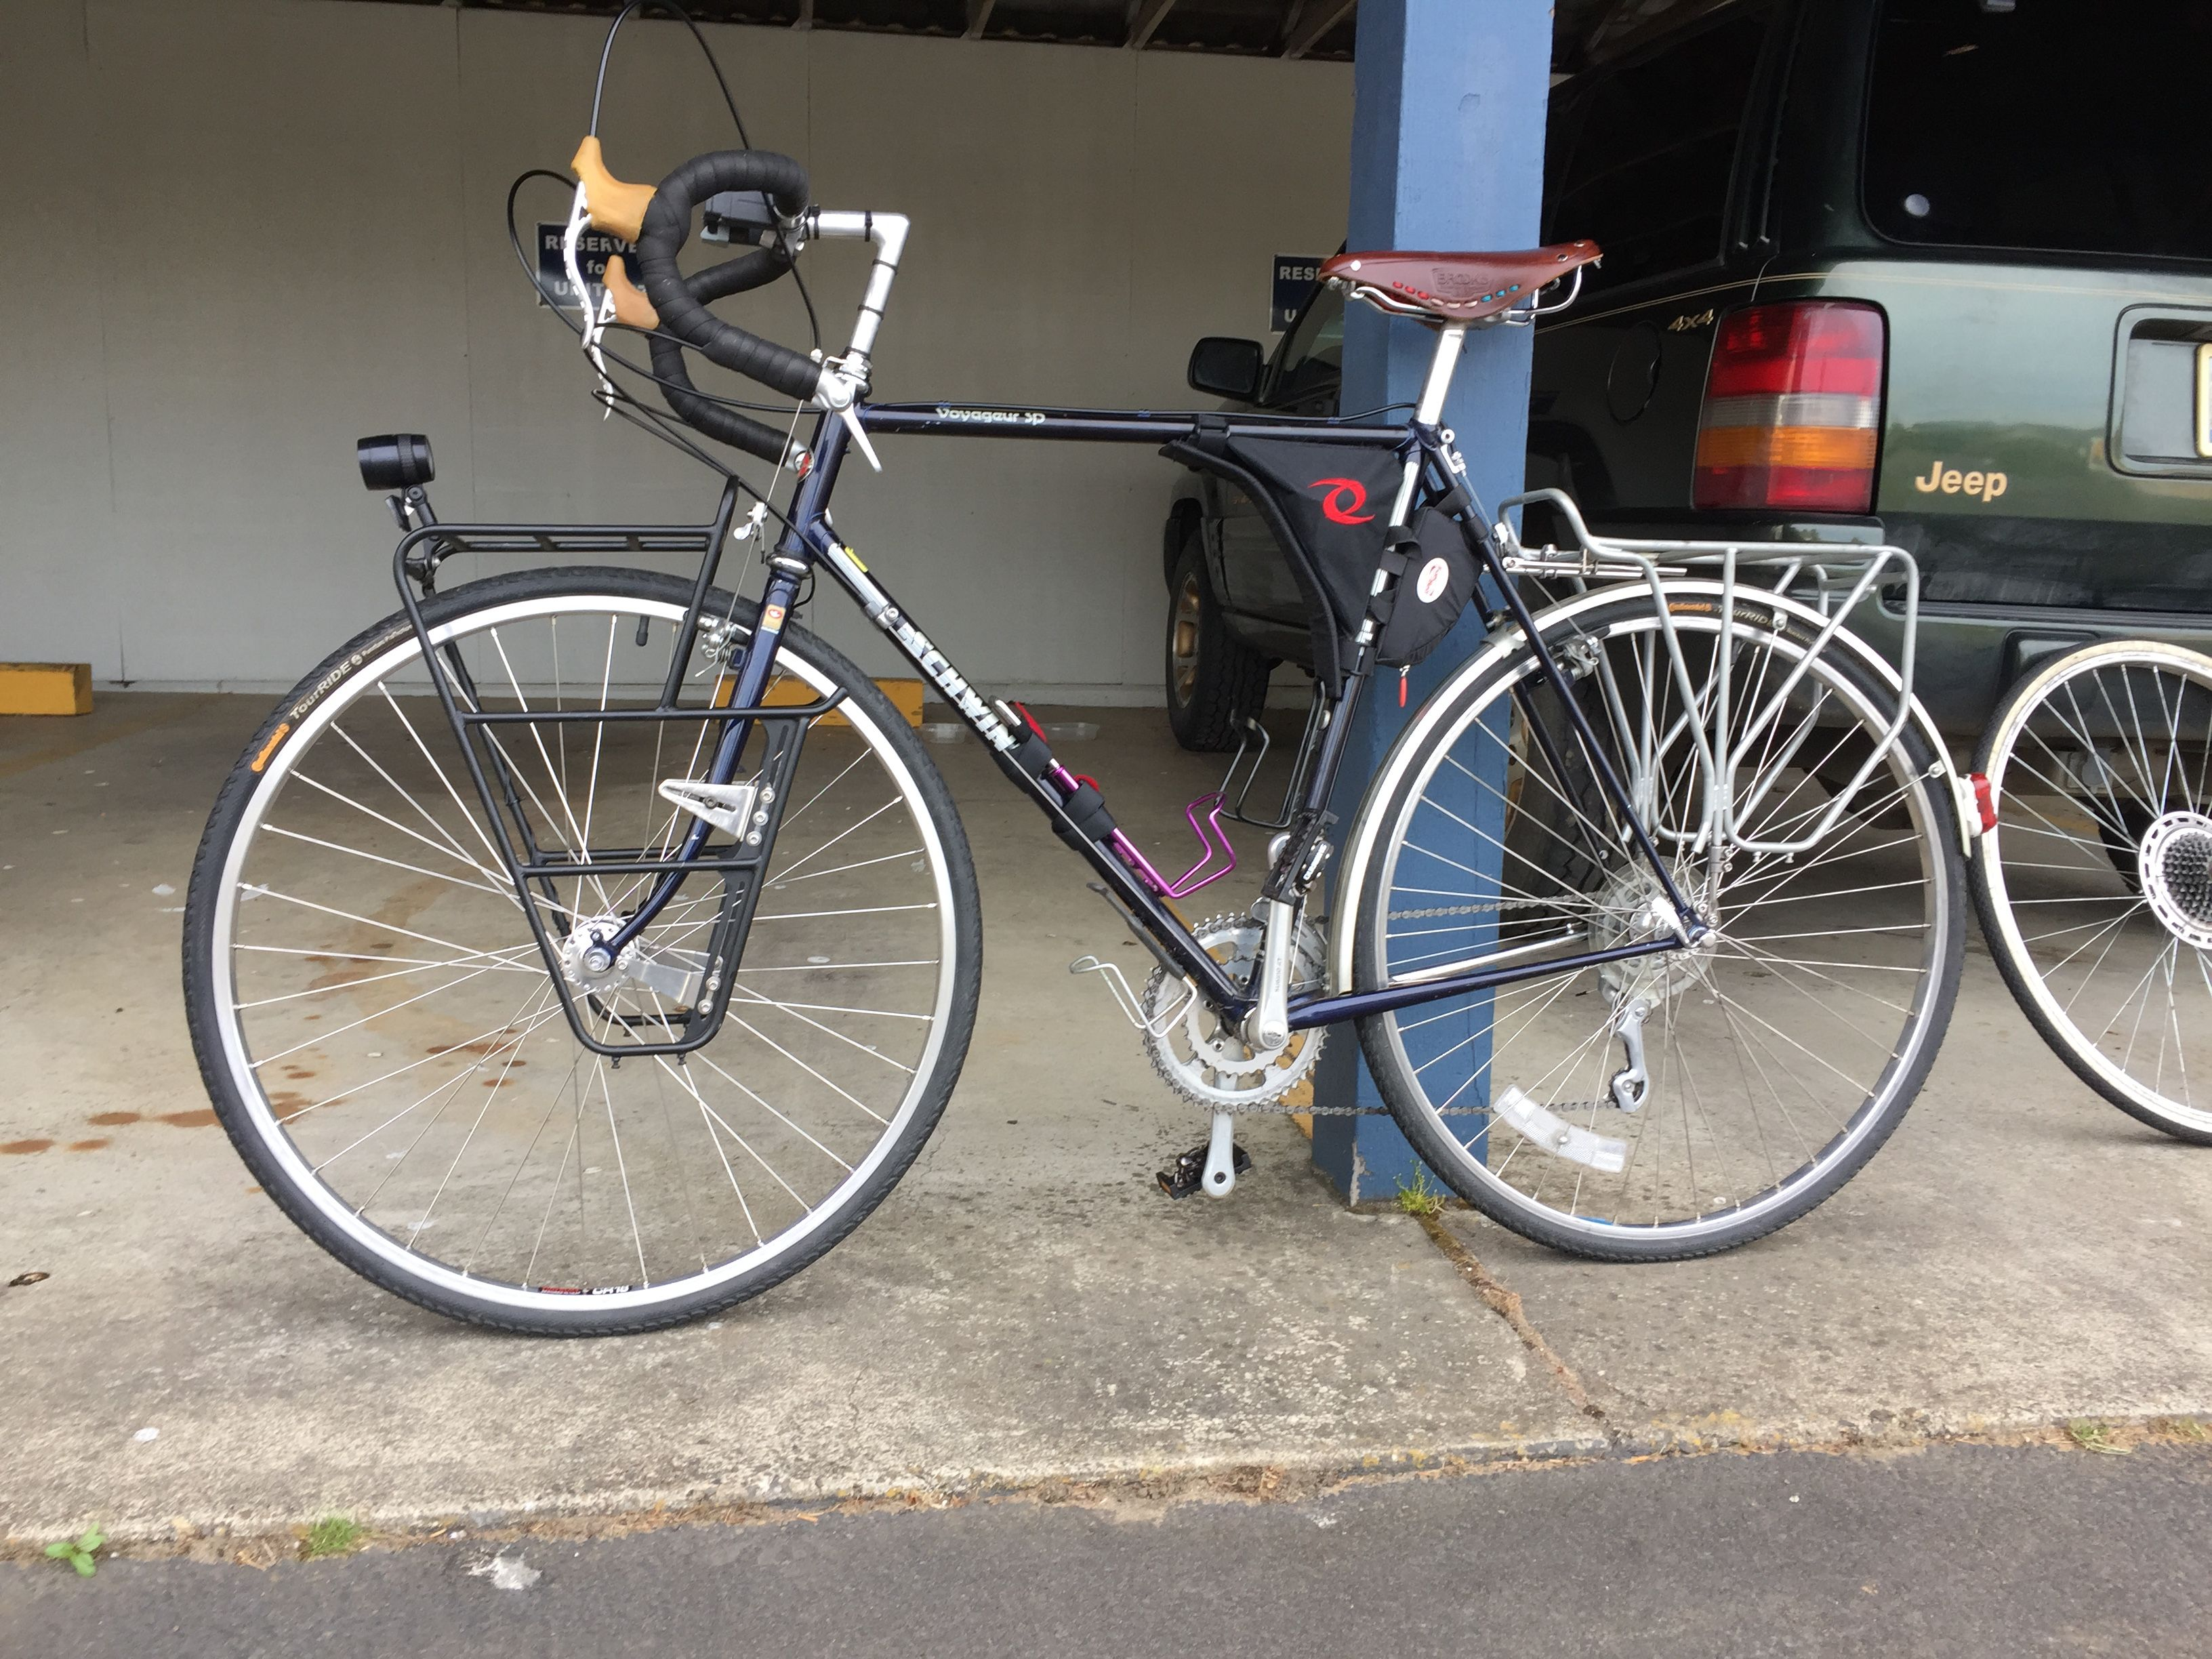 1985 Schwinn Voyageur sp Touring Bicycles 0971f7a77